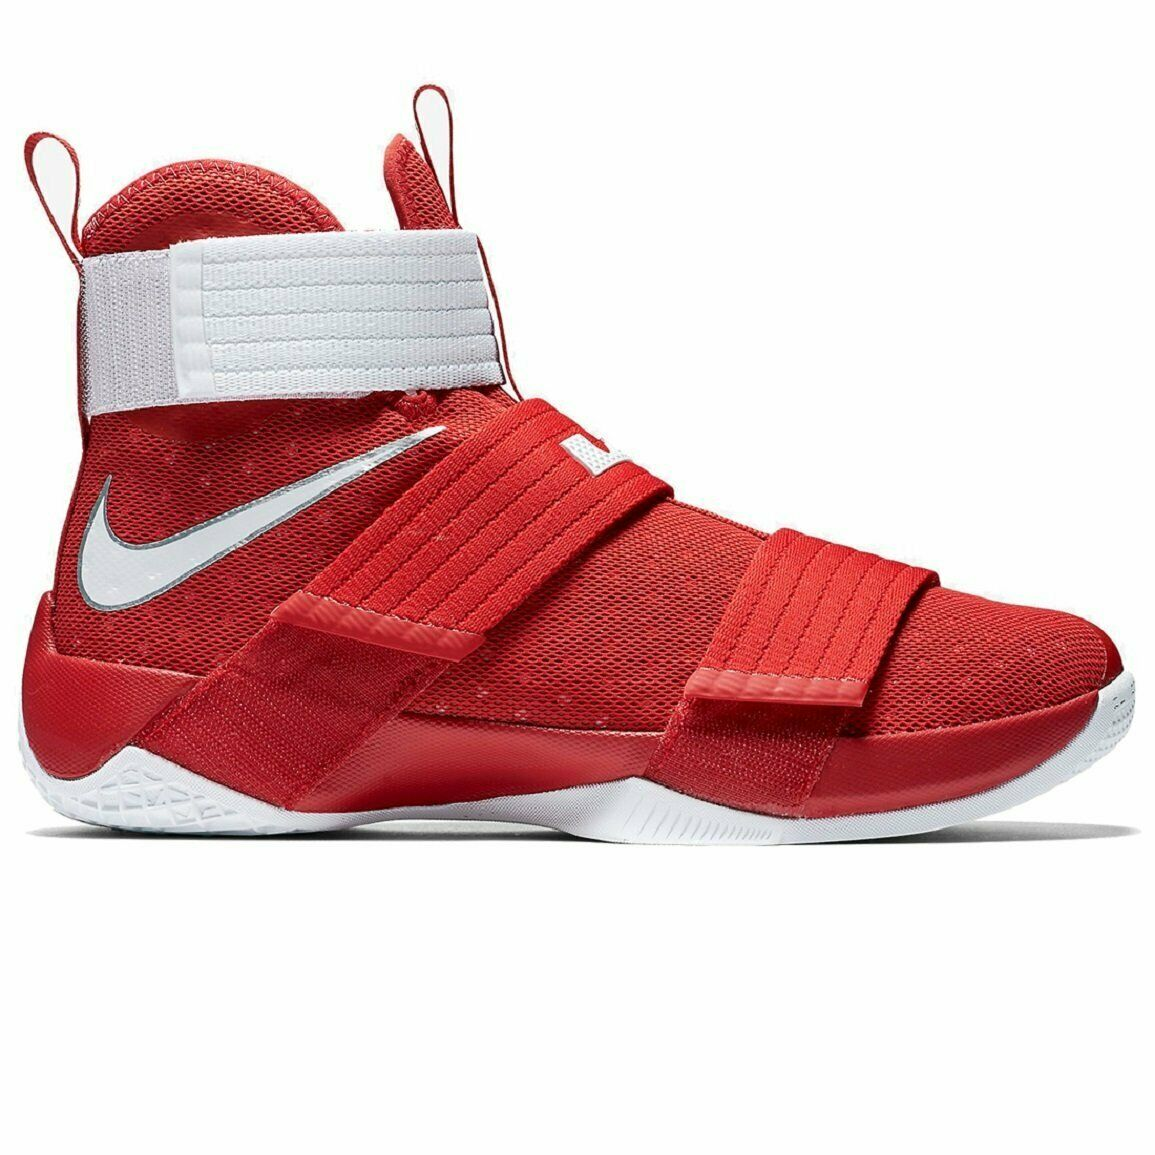 Nike nk844380 601 Mens Lebron Soldier 10 TB